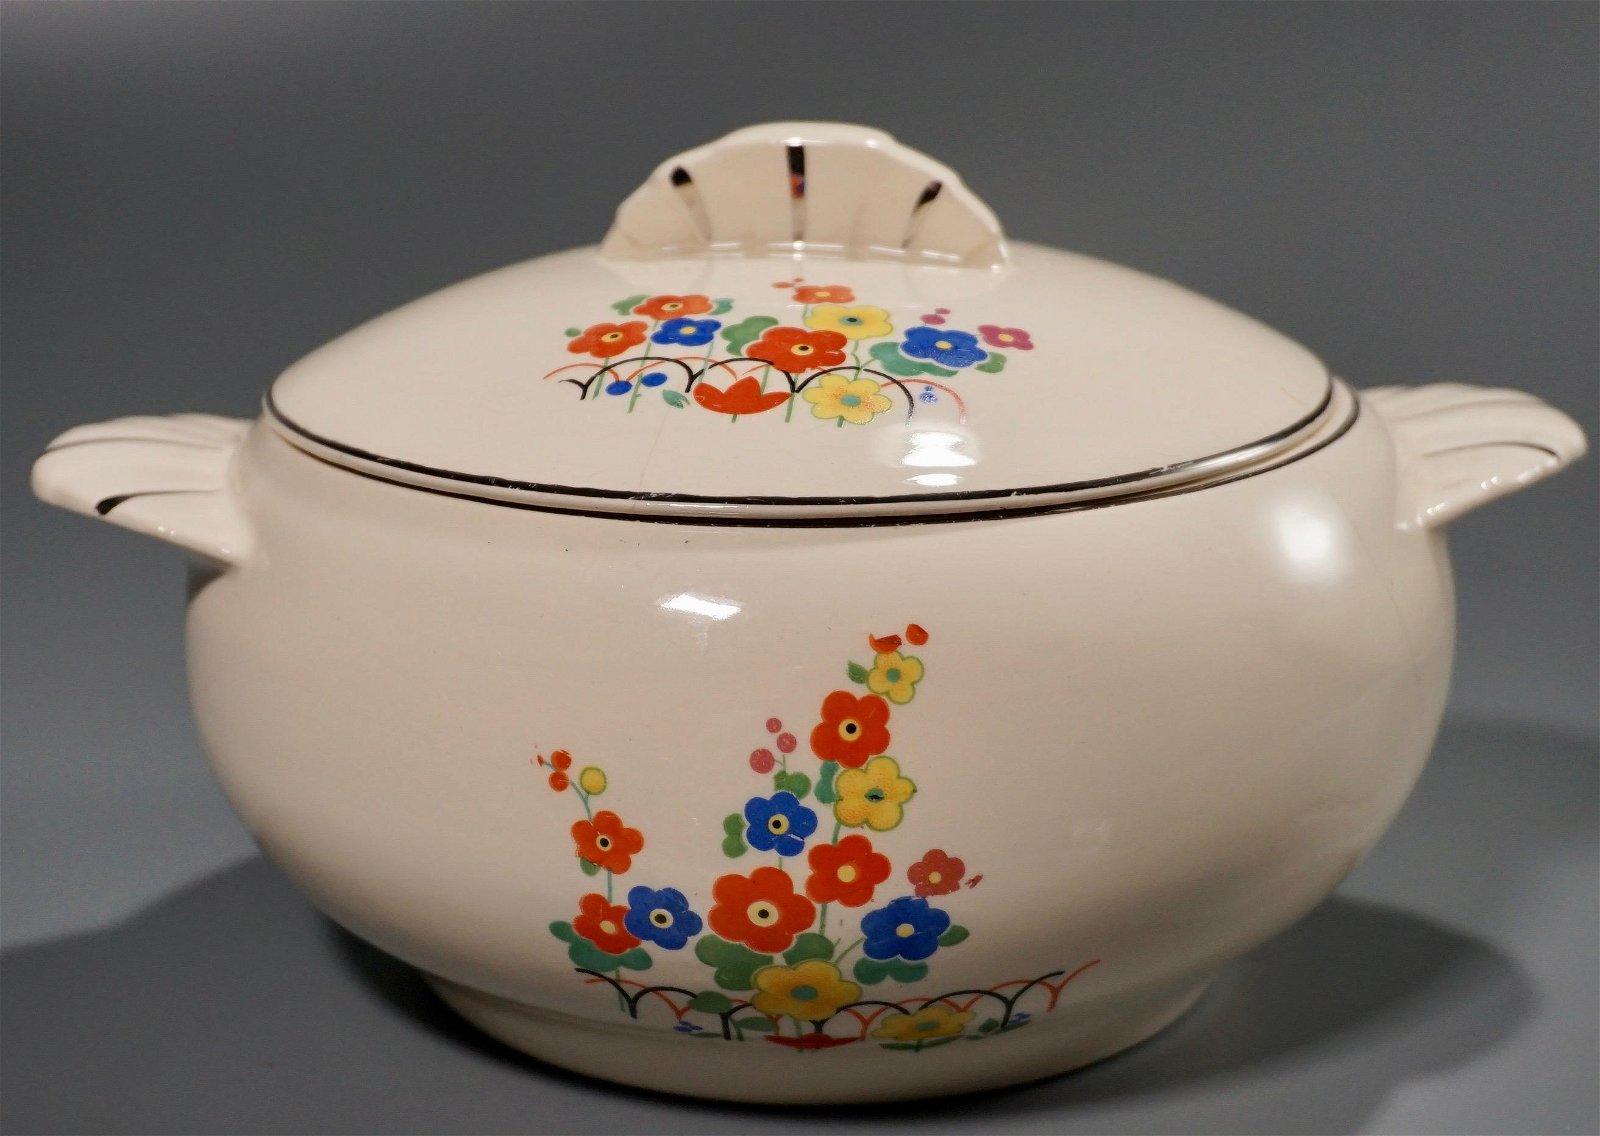 Paden City Pottery Co Vintage Art Deco Lidded Bowl